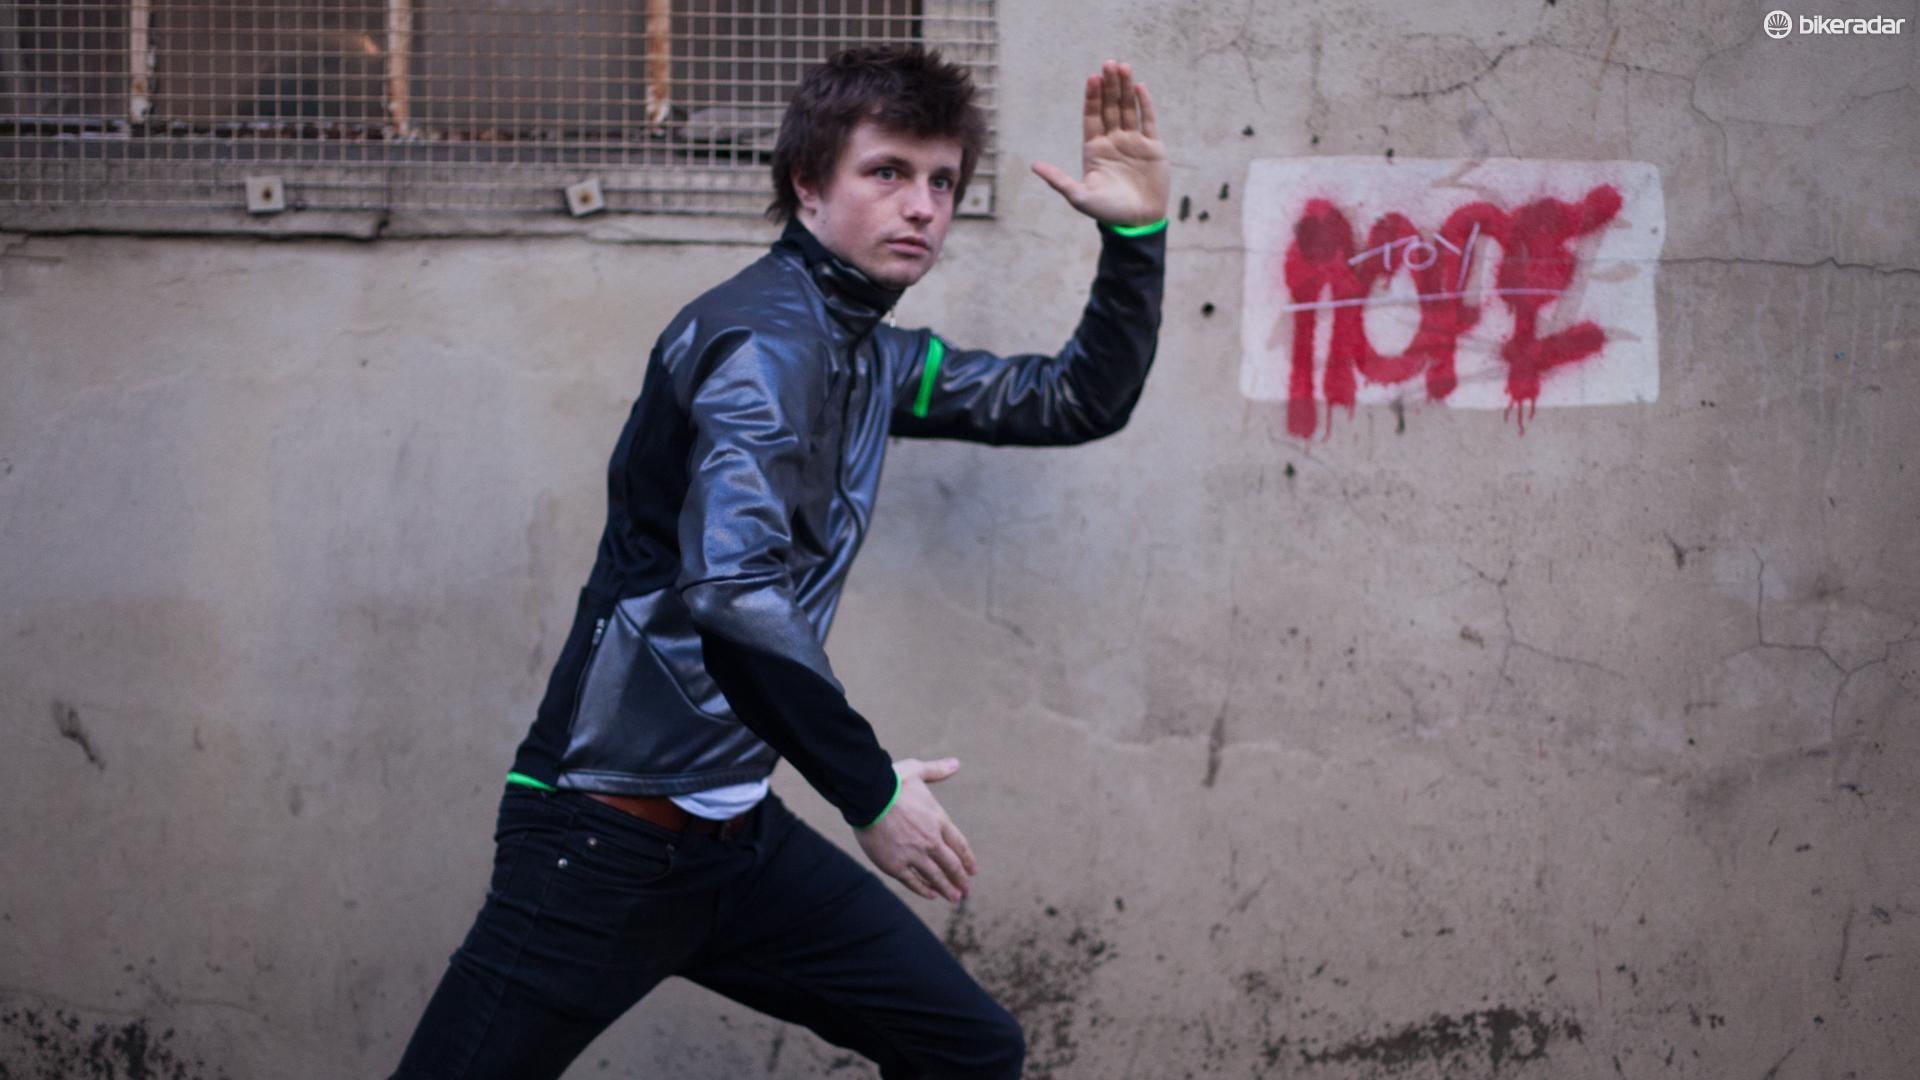 Young Jack models the Q36.5 Termica jacket